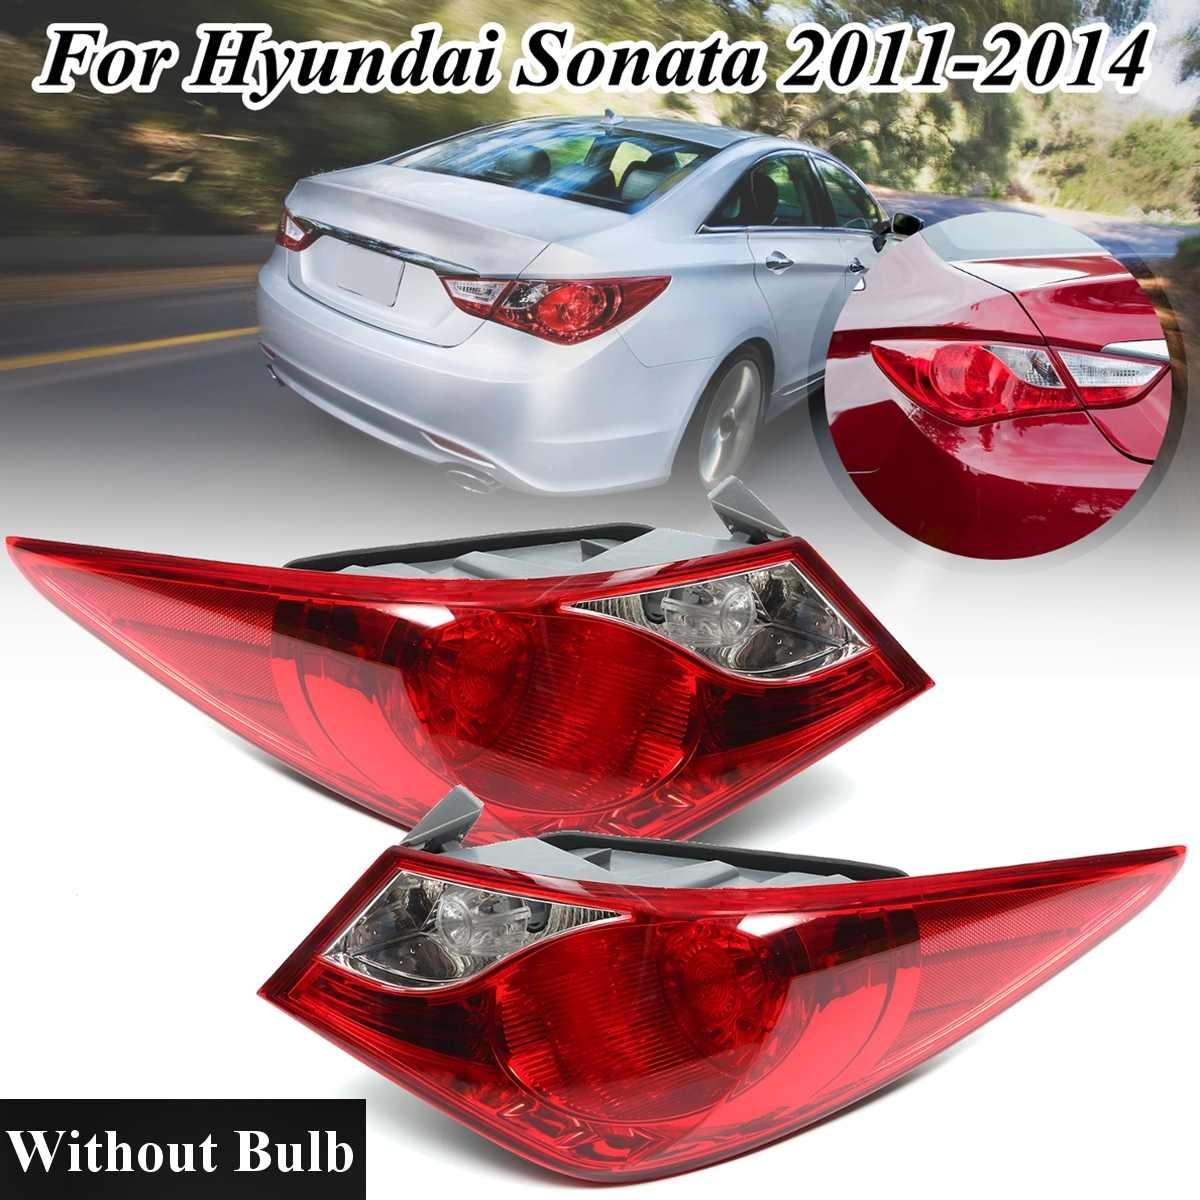 2012 Hyundai Sonata Tail Light Wiring Harness from ae01.alicdn.com